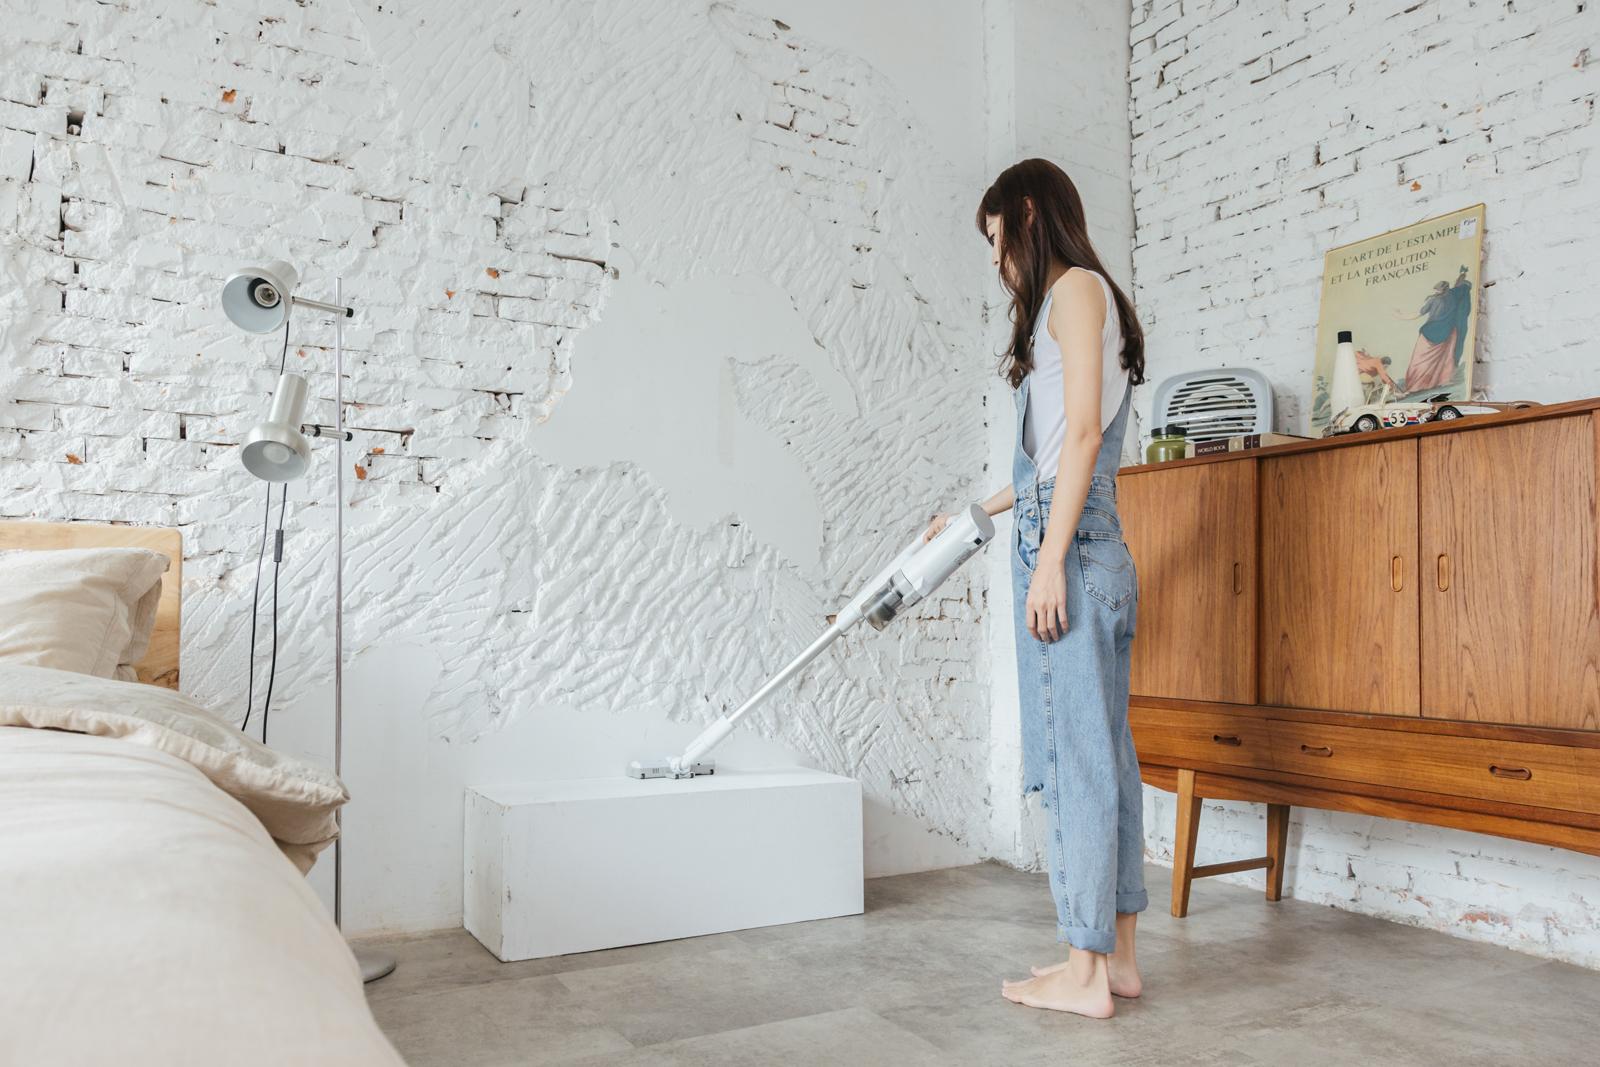 Panasonic 無線吸塵器 MC-SB30J 輕巧大吸力微塵感知 簡單生活效率清潔